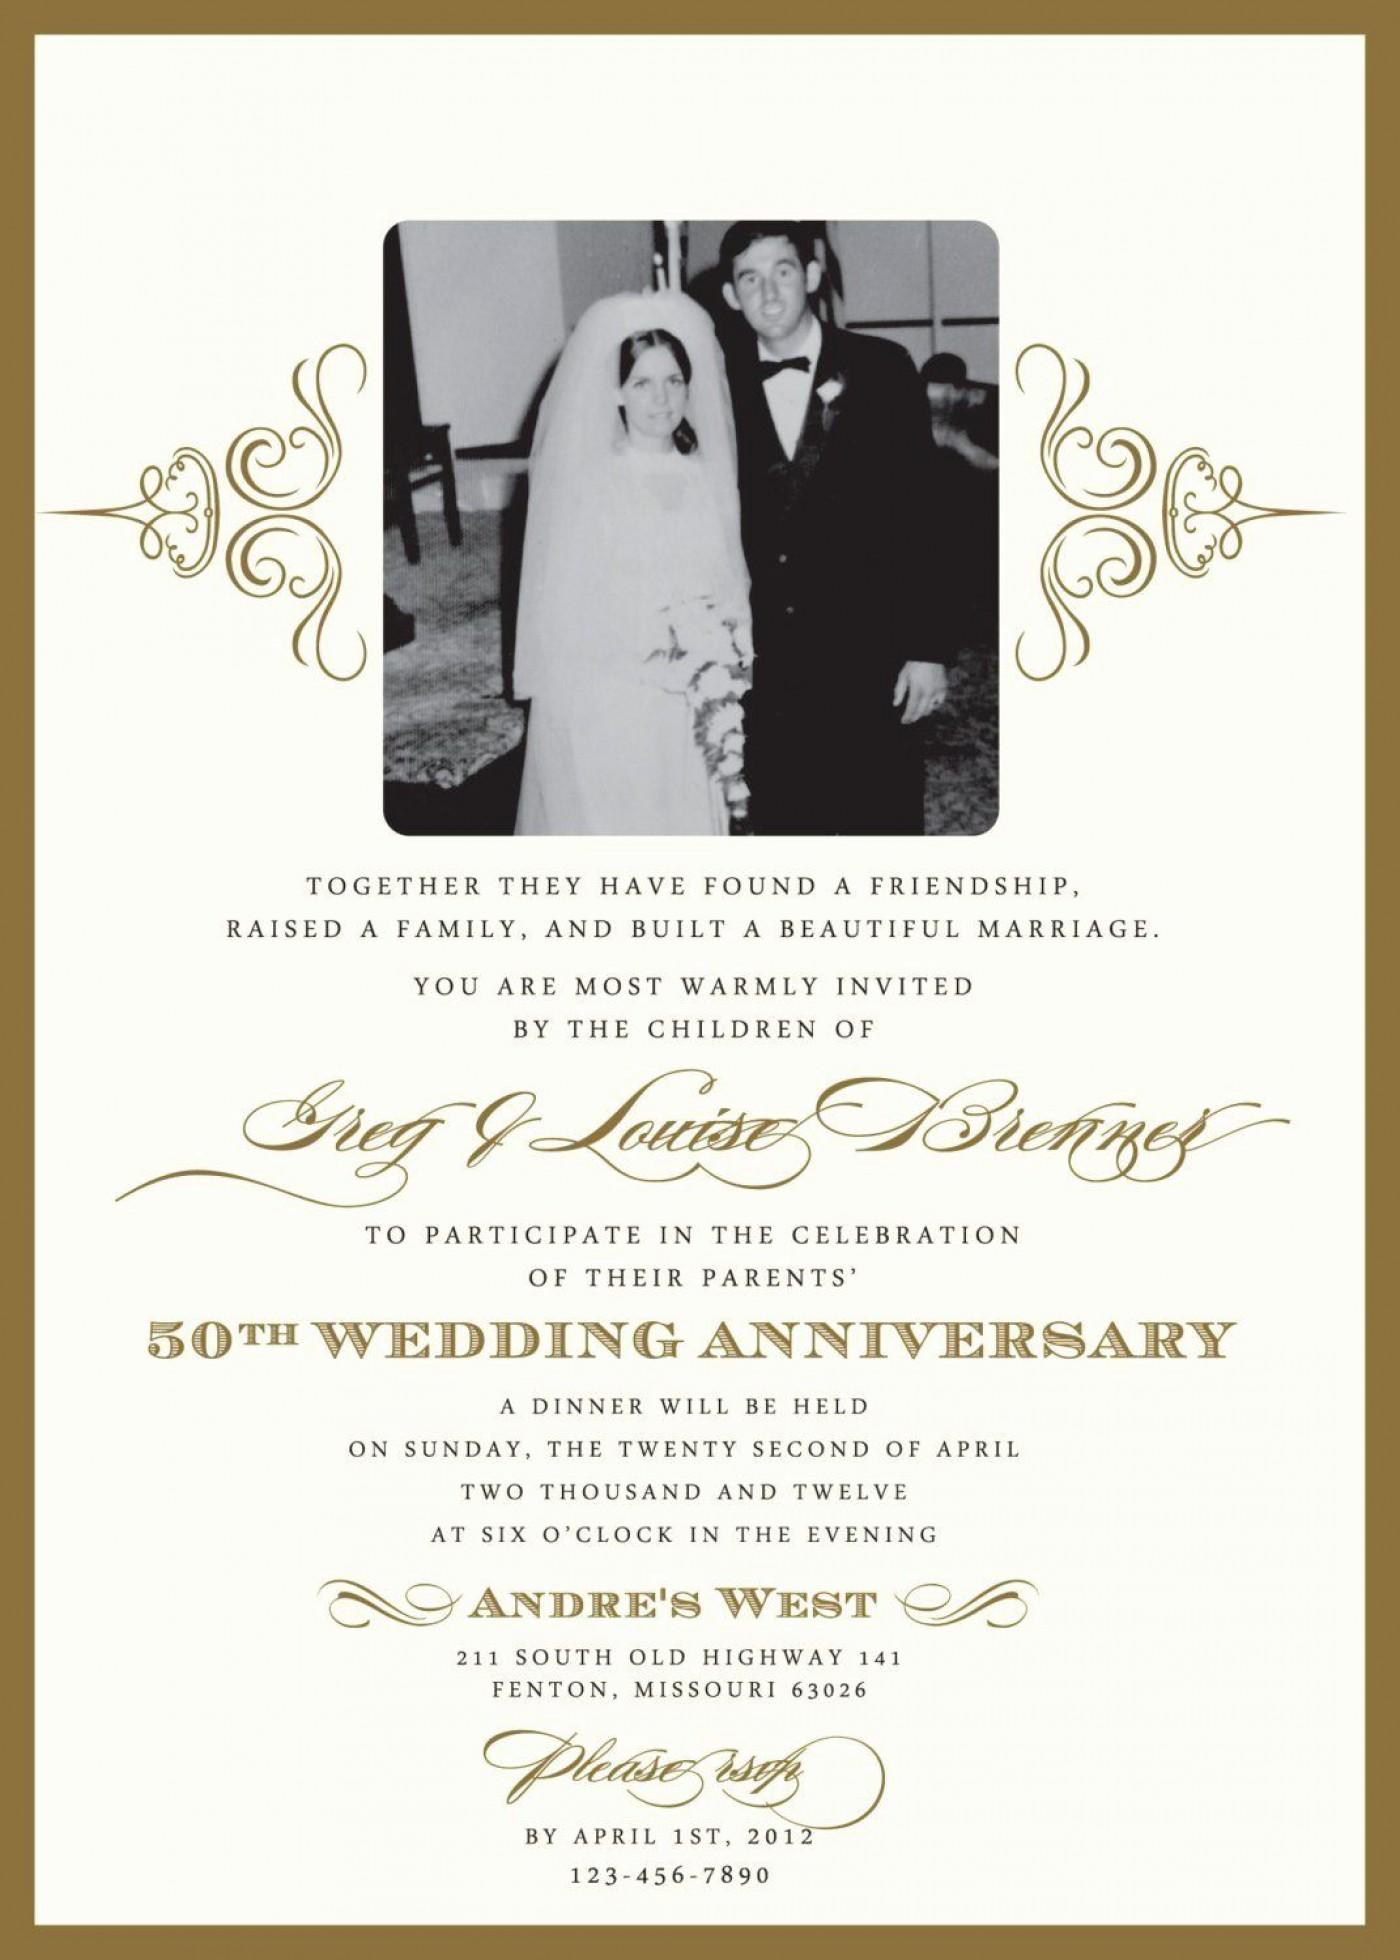 003 Sensational 50th Anniversary Party Invitation Template Photo  Wedding Free Download Microsoft Word1400